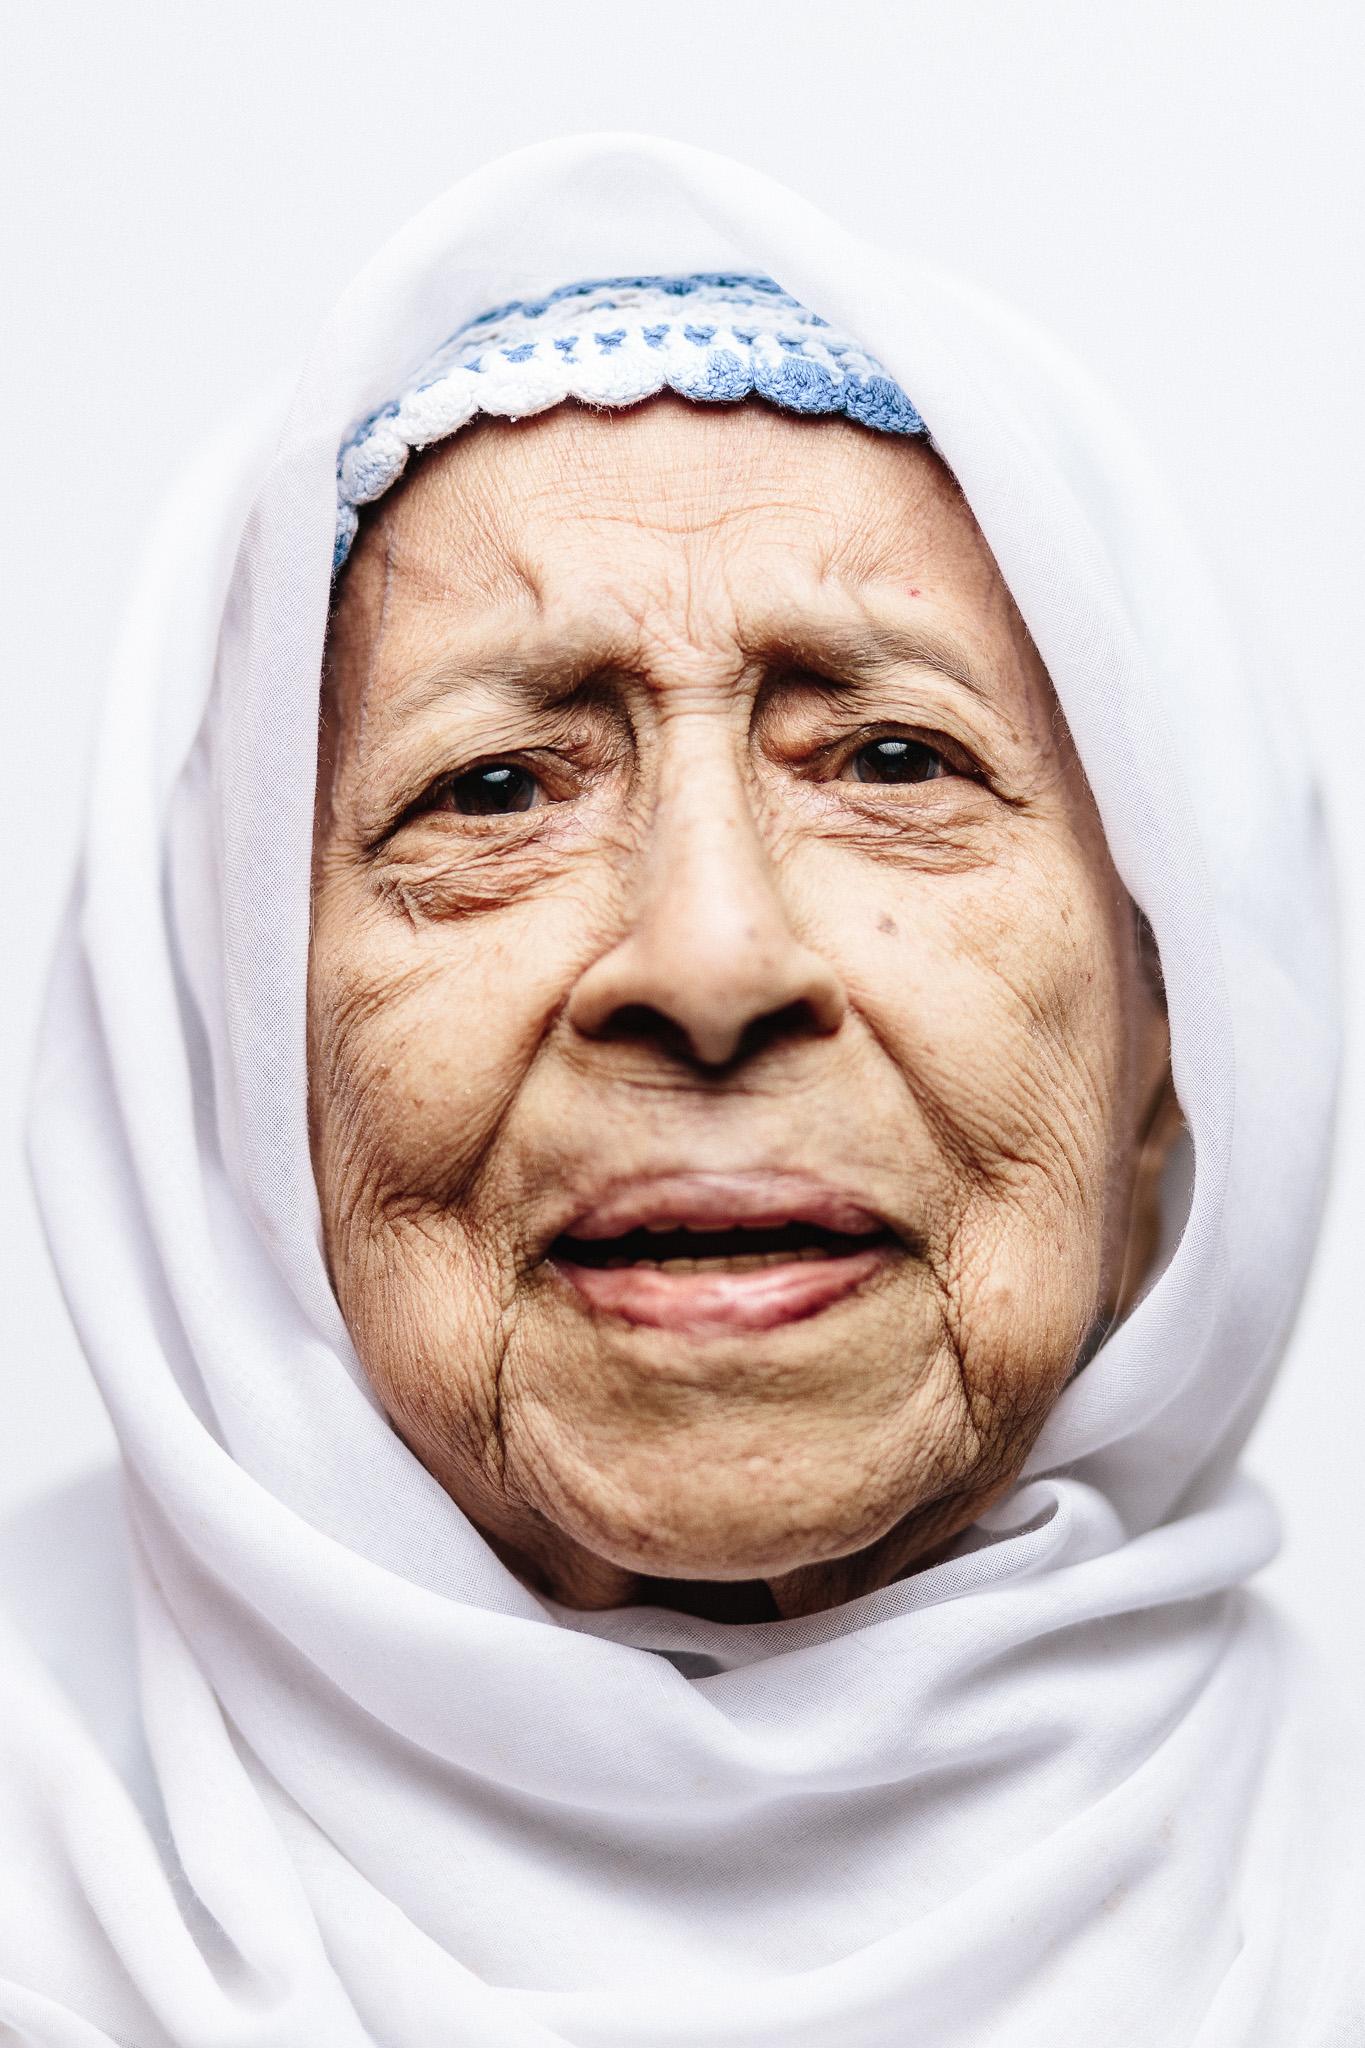 zainal-zainal-studio-centenarians-care-duke-nus-singapore-photographer-01.jpg